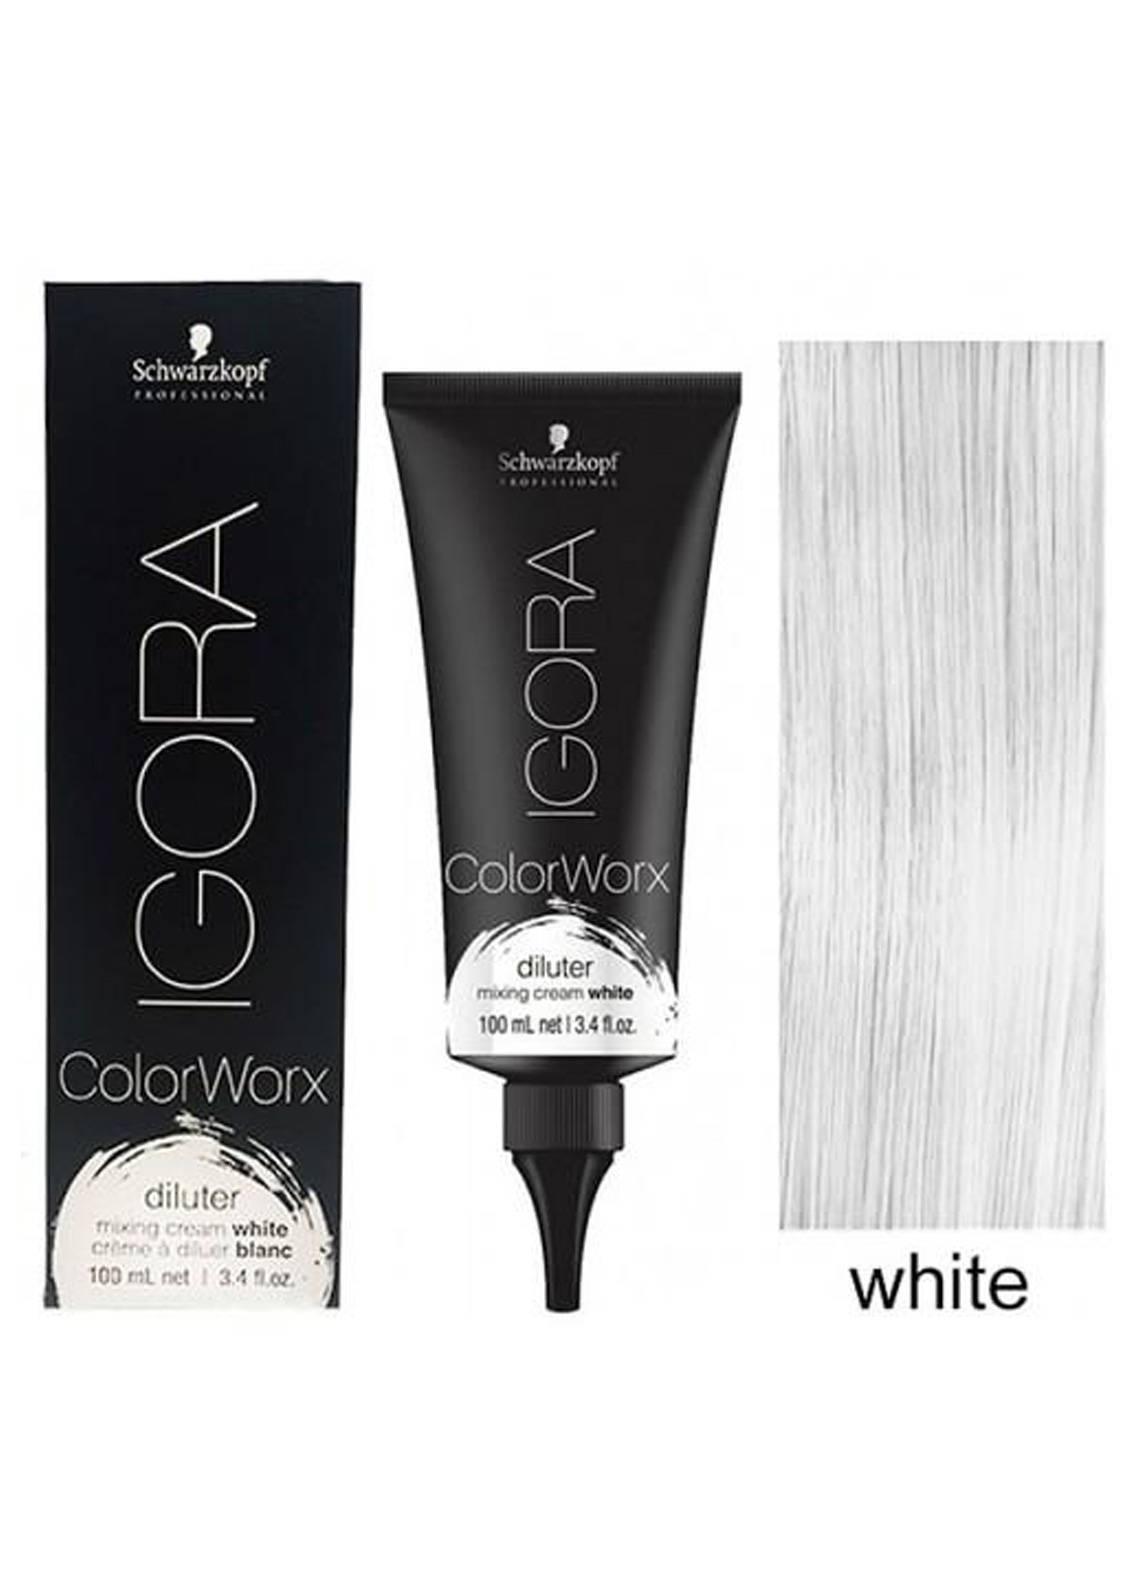 764e0baa6f Schwarzkopf Online: Schwarzkopf Hair Care Products | Hair Styling ...